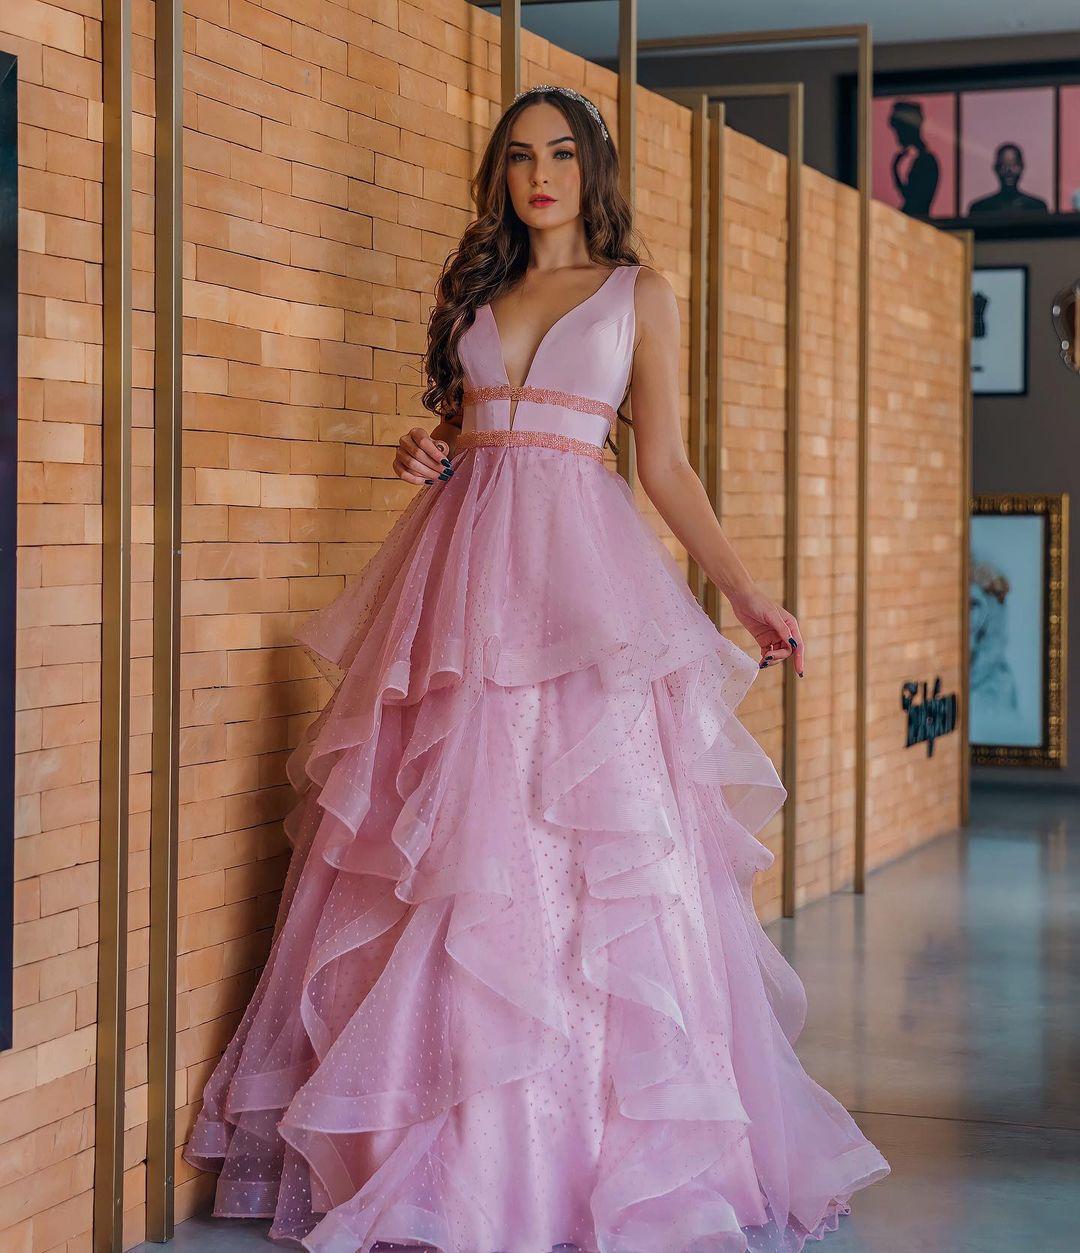 anne karoline lisboa, miss simpatia de miss brasil mundo 2019. 13264911